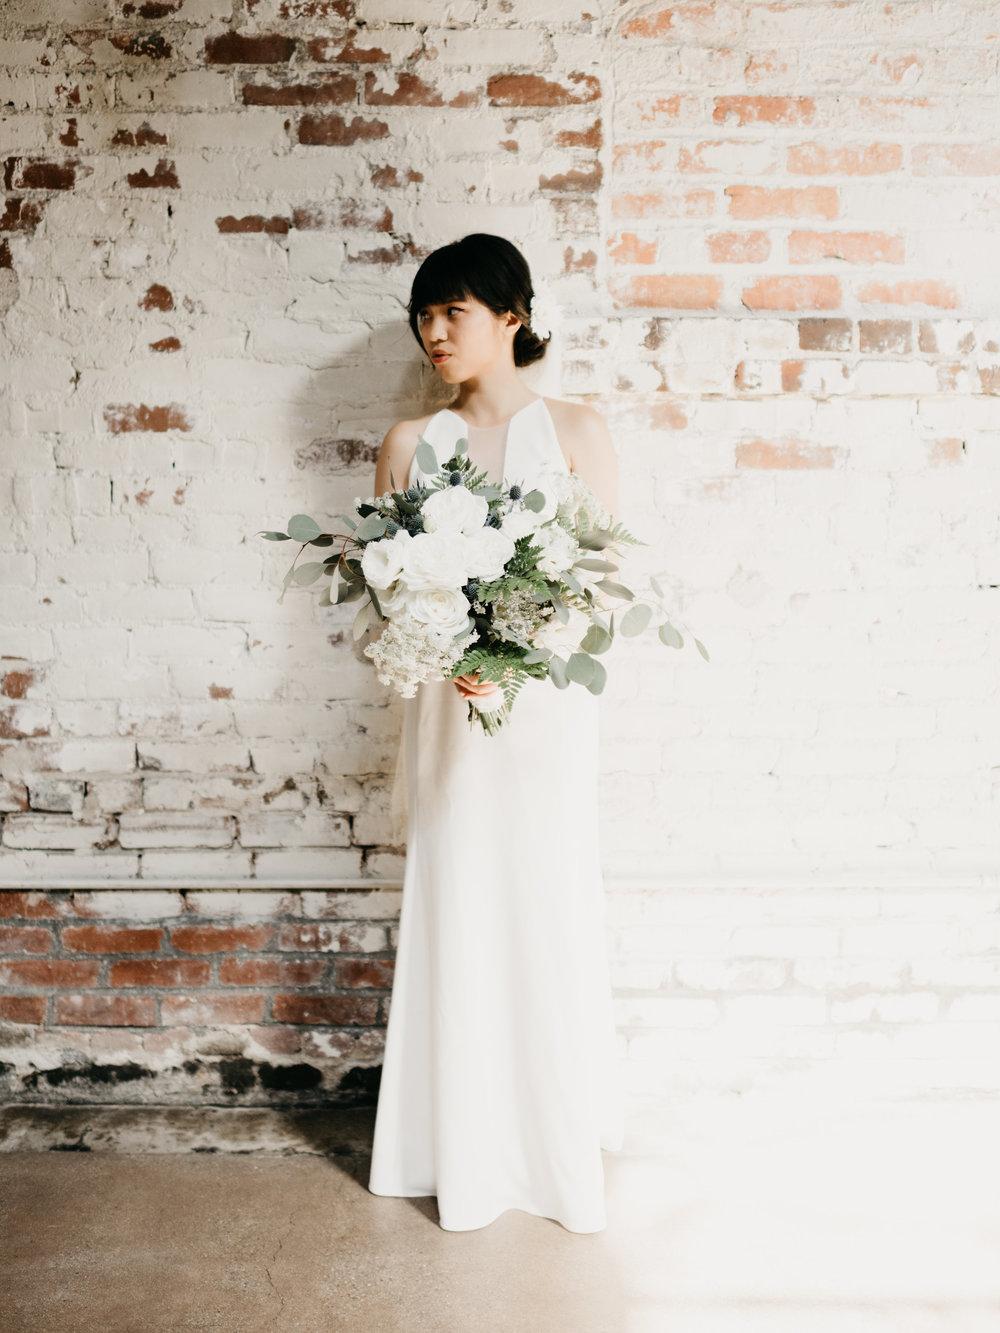 Millwick-wedding-planner46.jpg